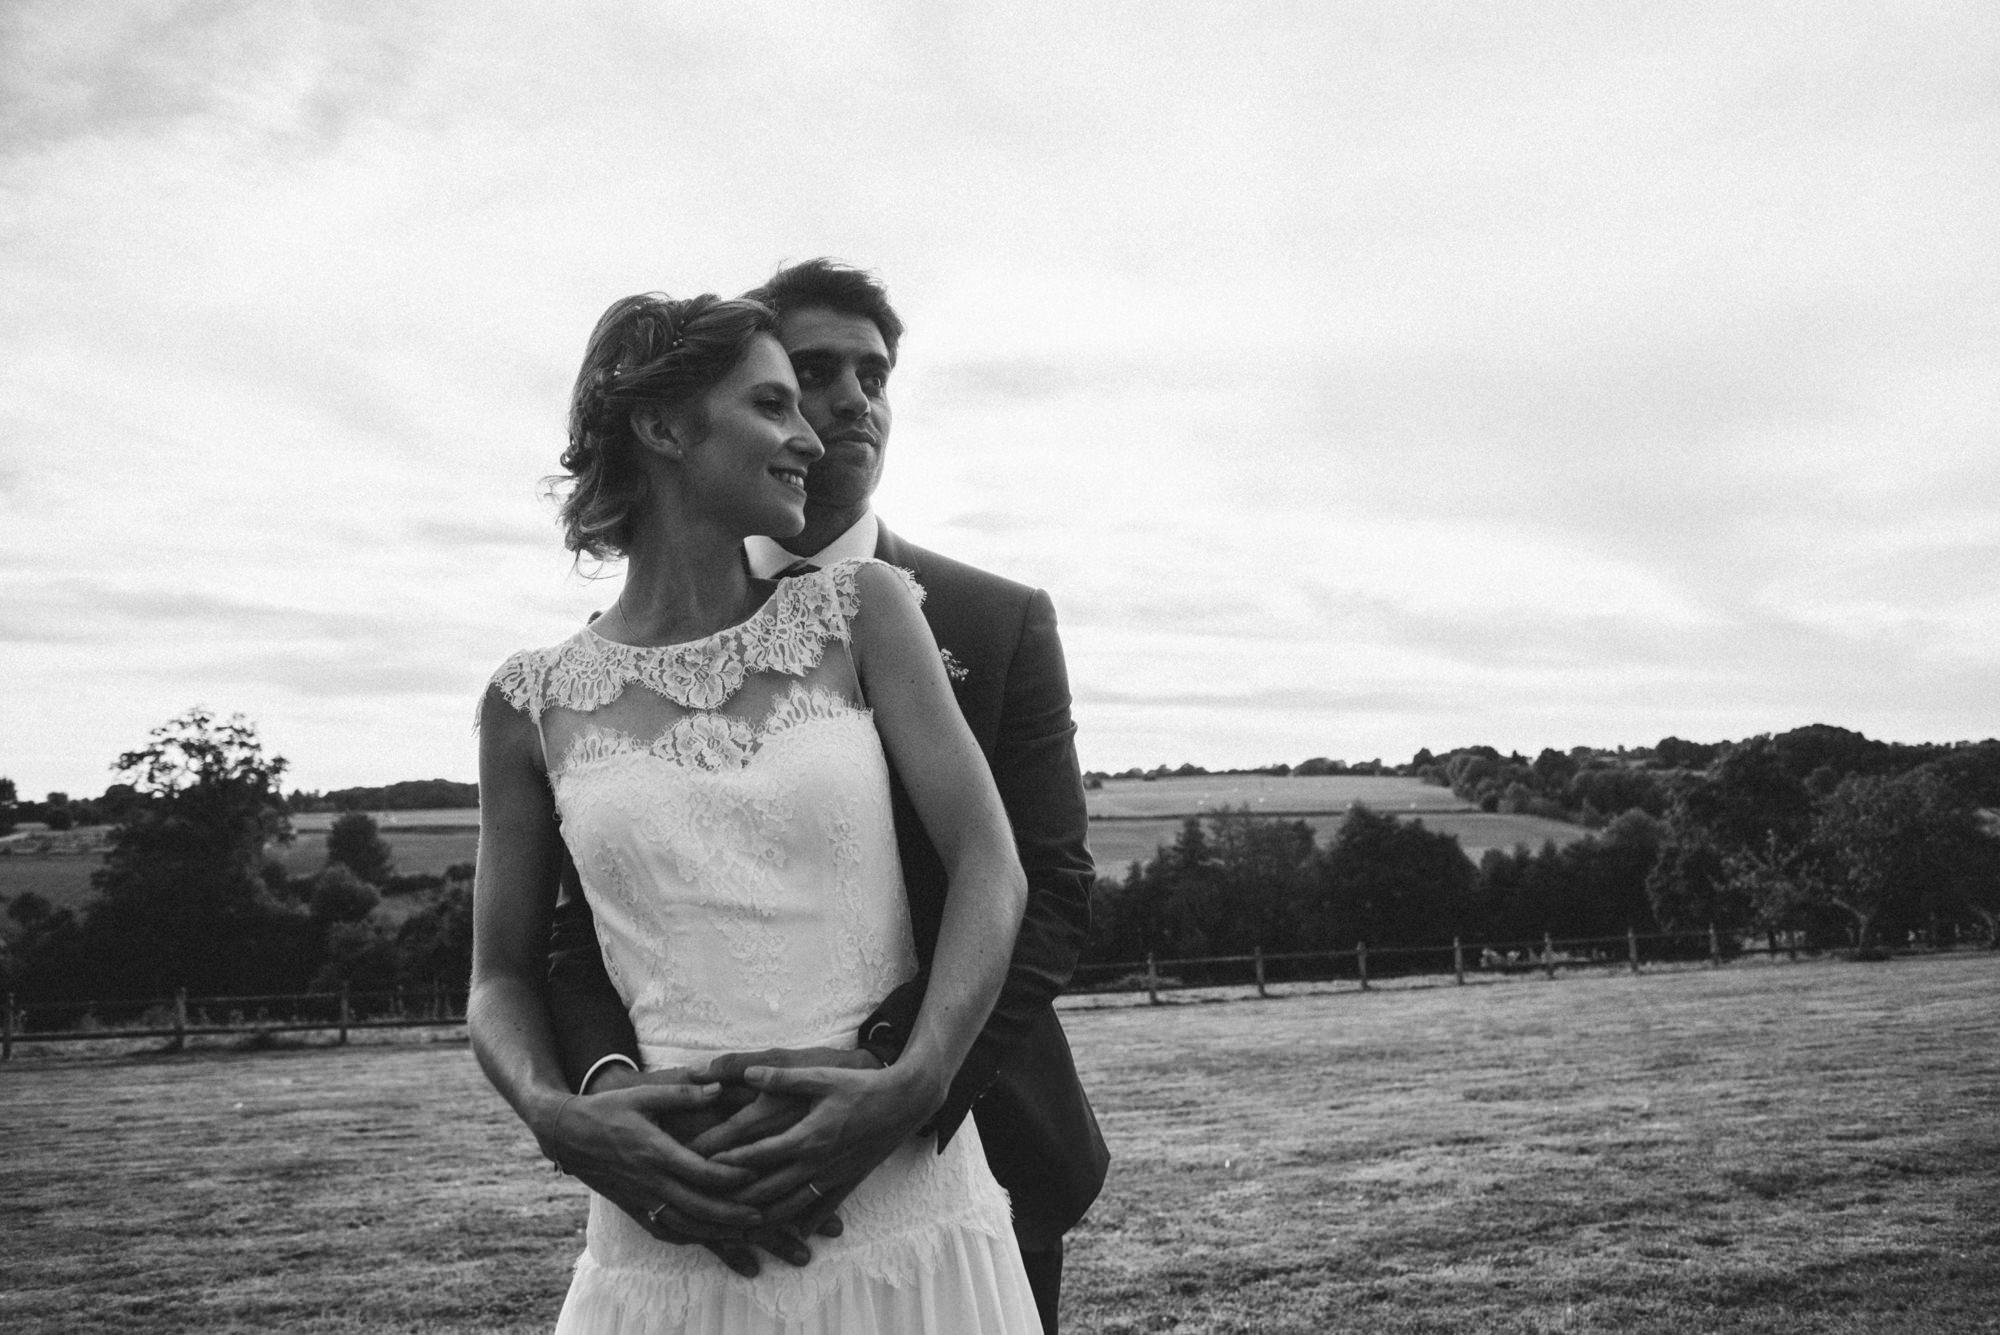 photographe-mariage-paris-nantes-provence-angers-56